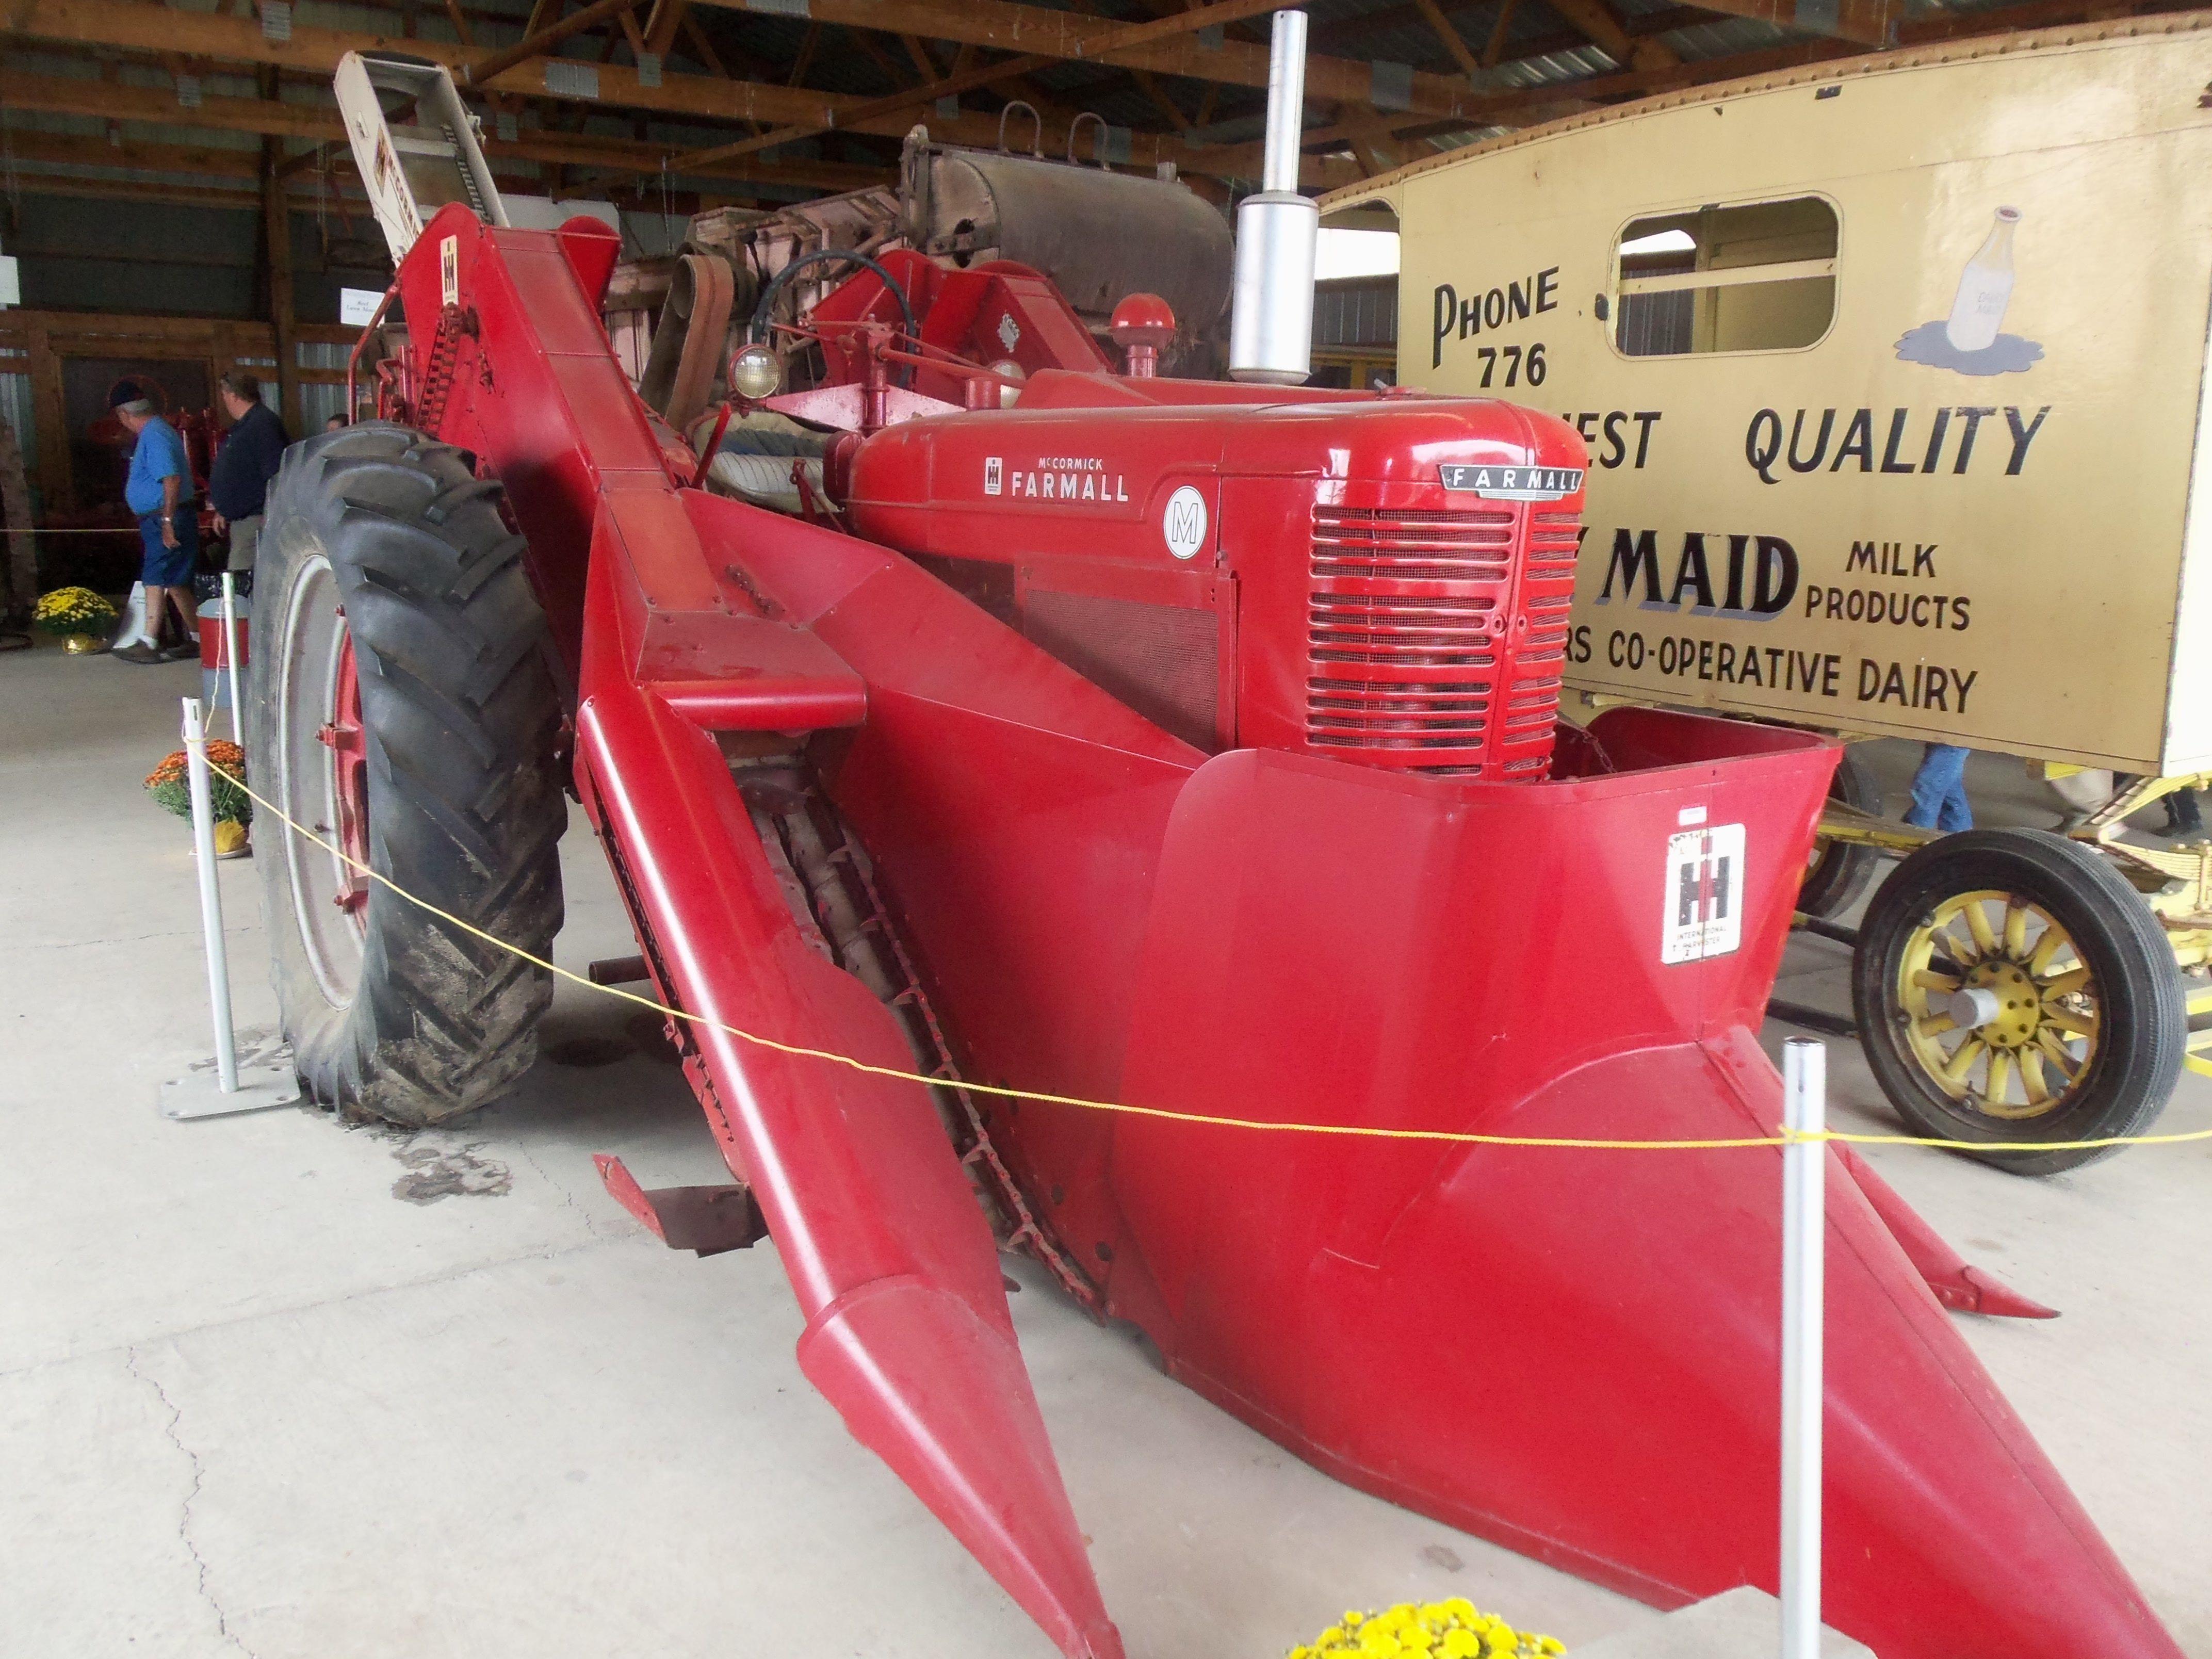 Cartoon Tractor Corn Picker : Farmall m with red corn picker international